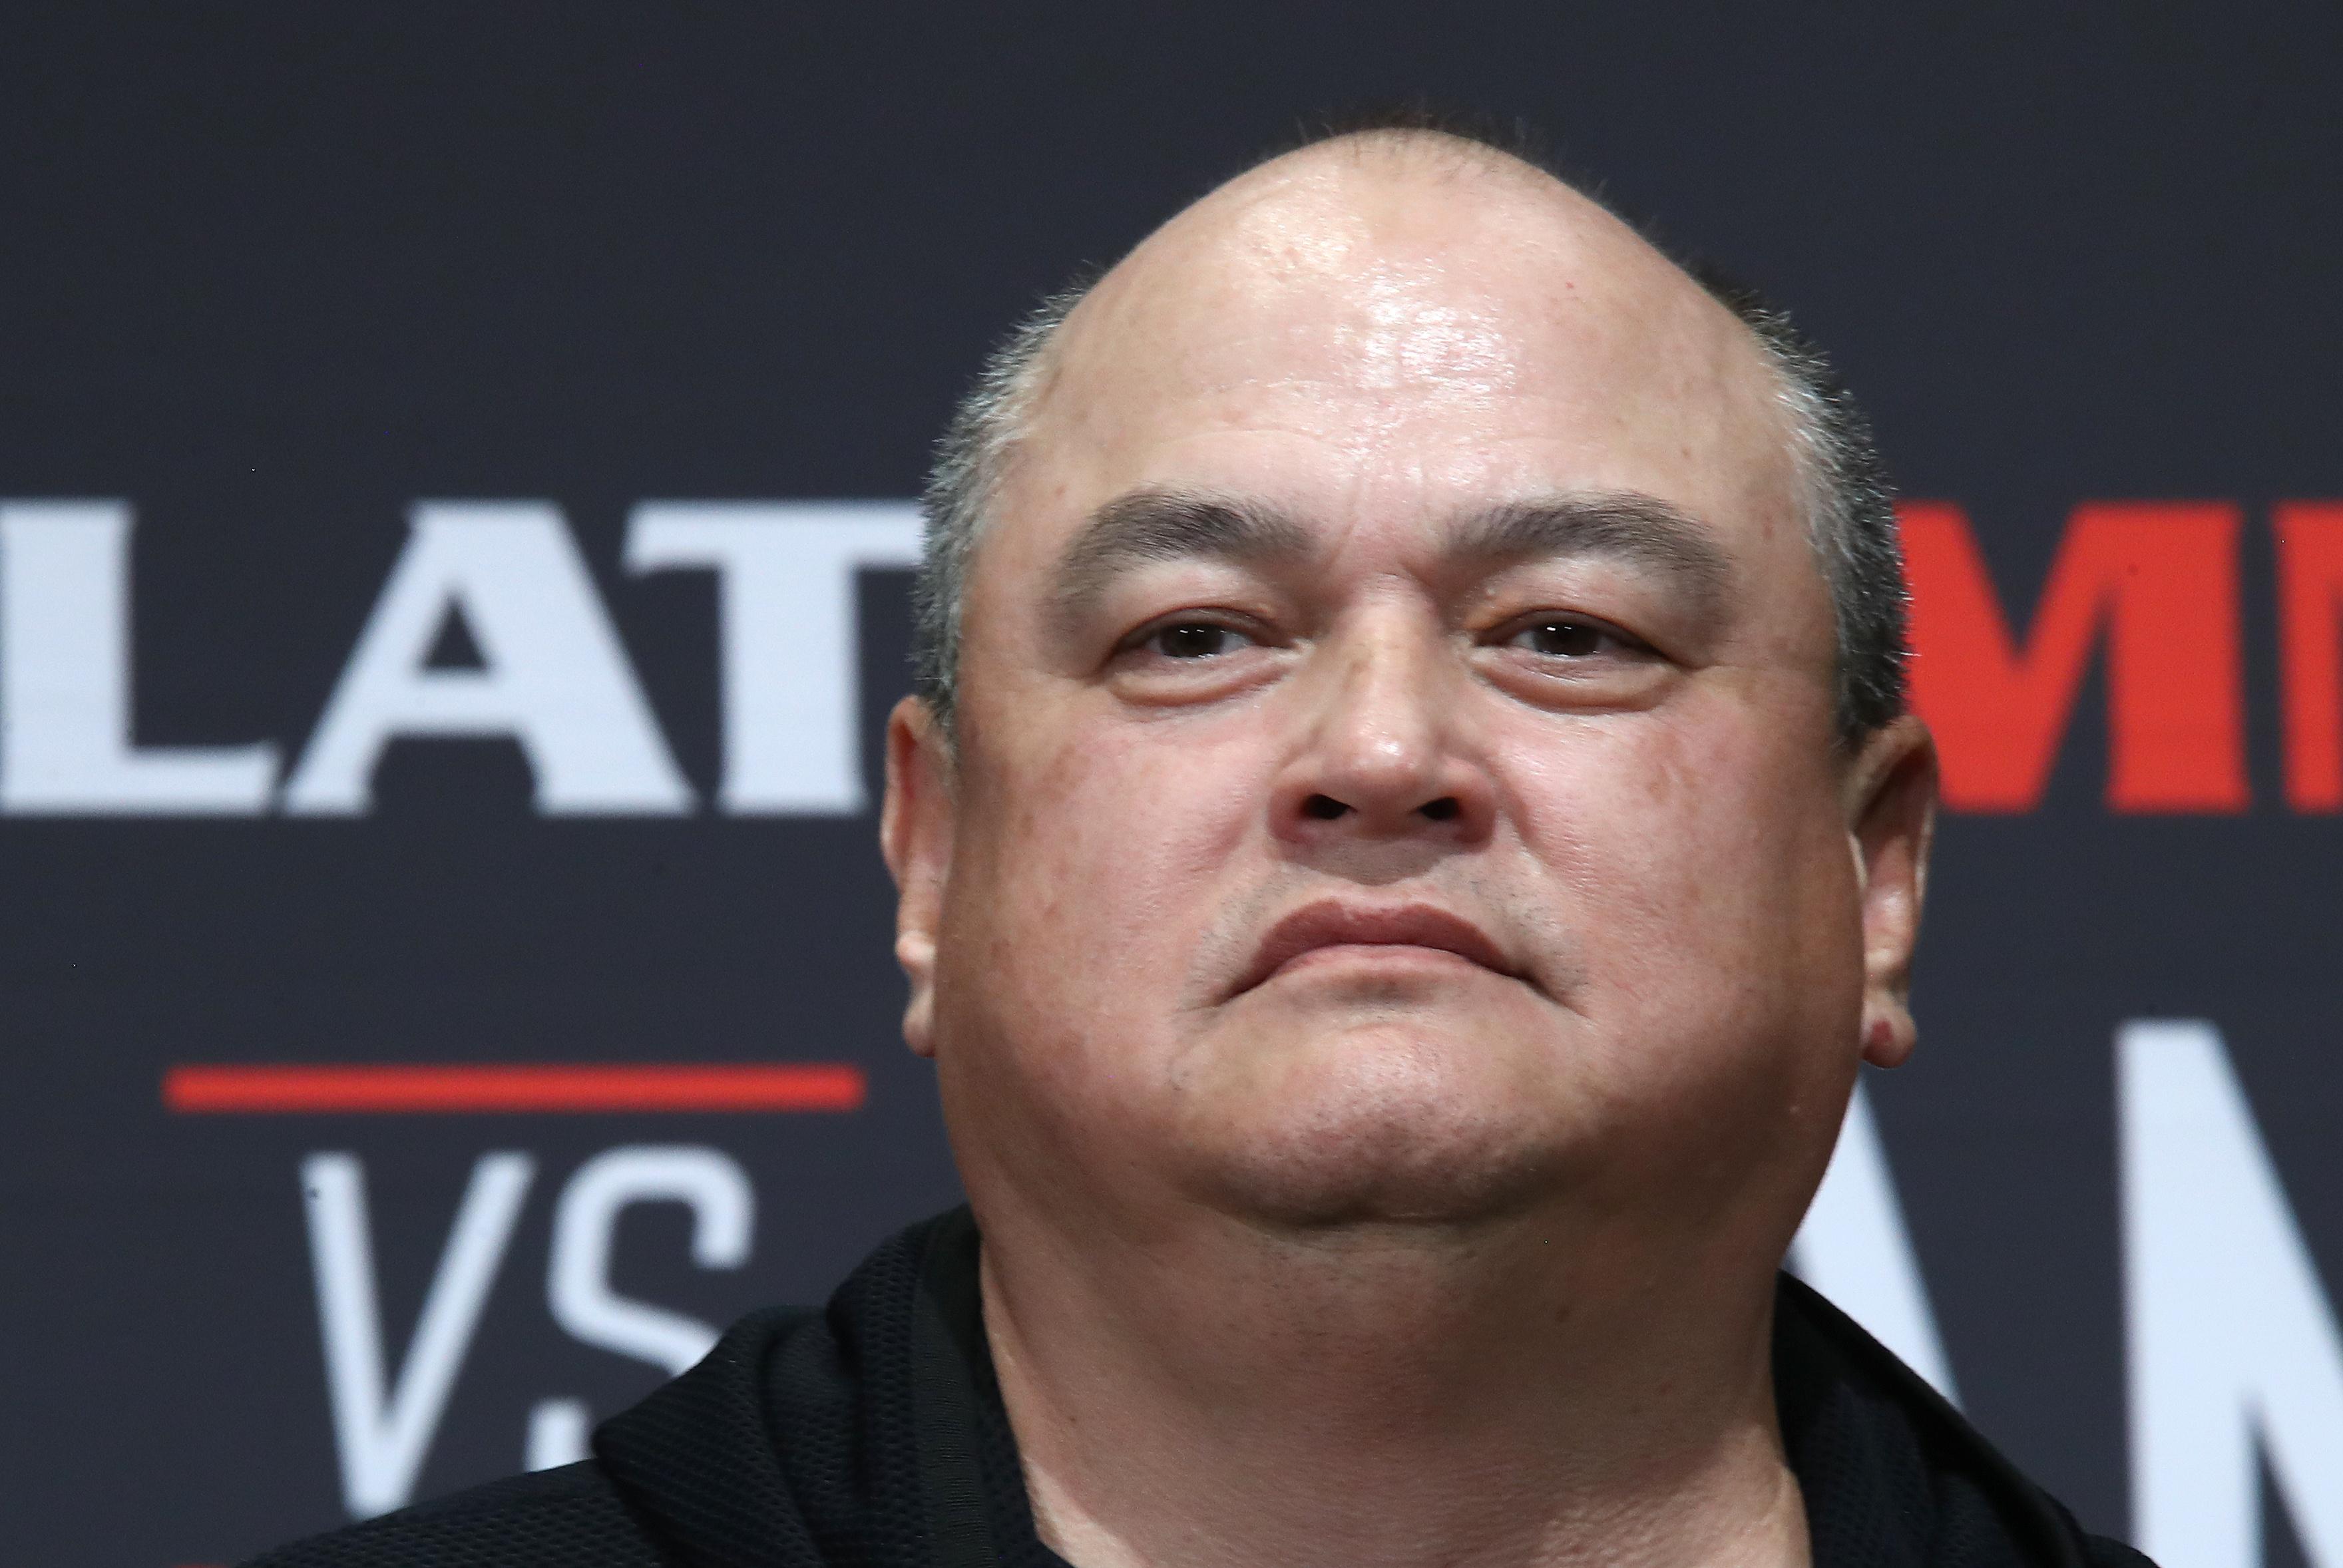 MMA fighters Emelianenko and Jackson weigh in ahead of Bellator 237 main event in Japan